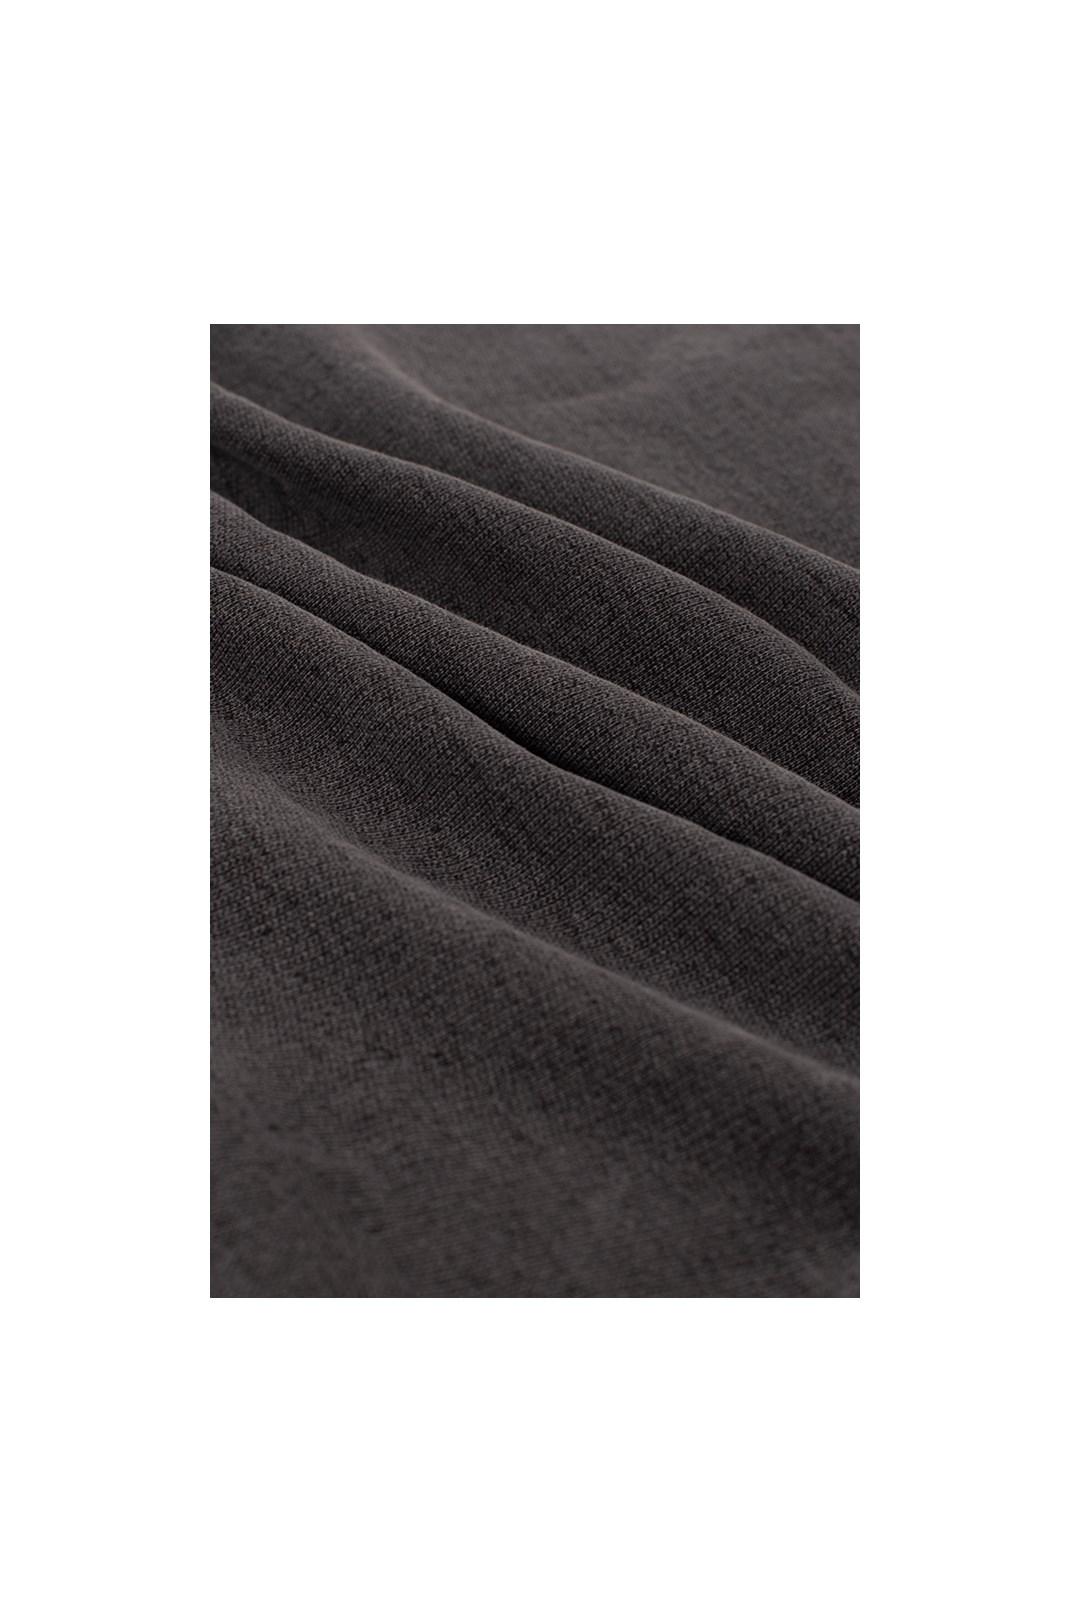 Moletom Canguru Approve Mirage Cinza Color